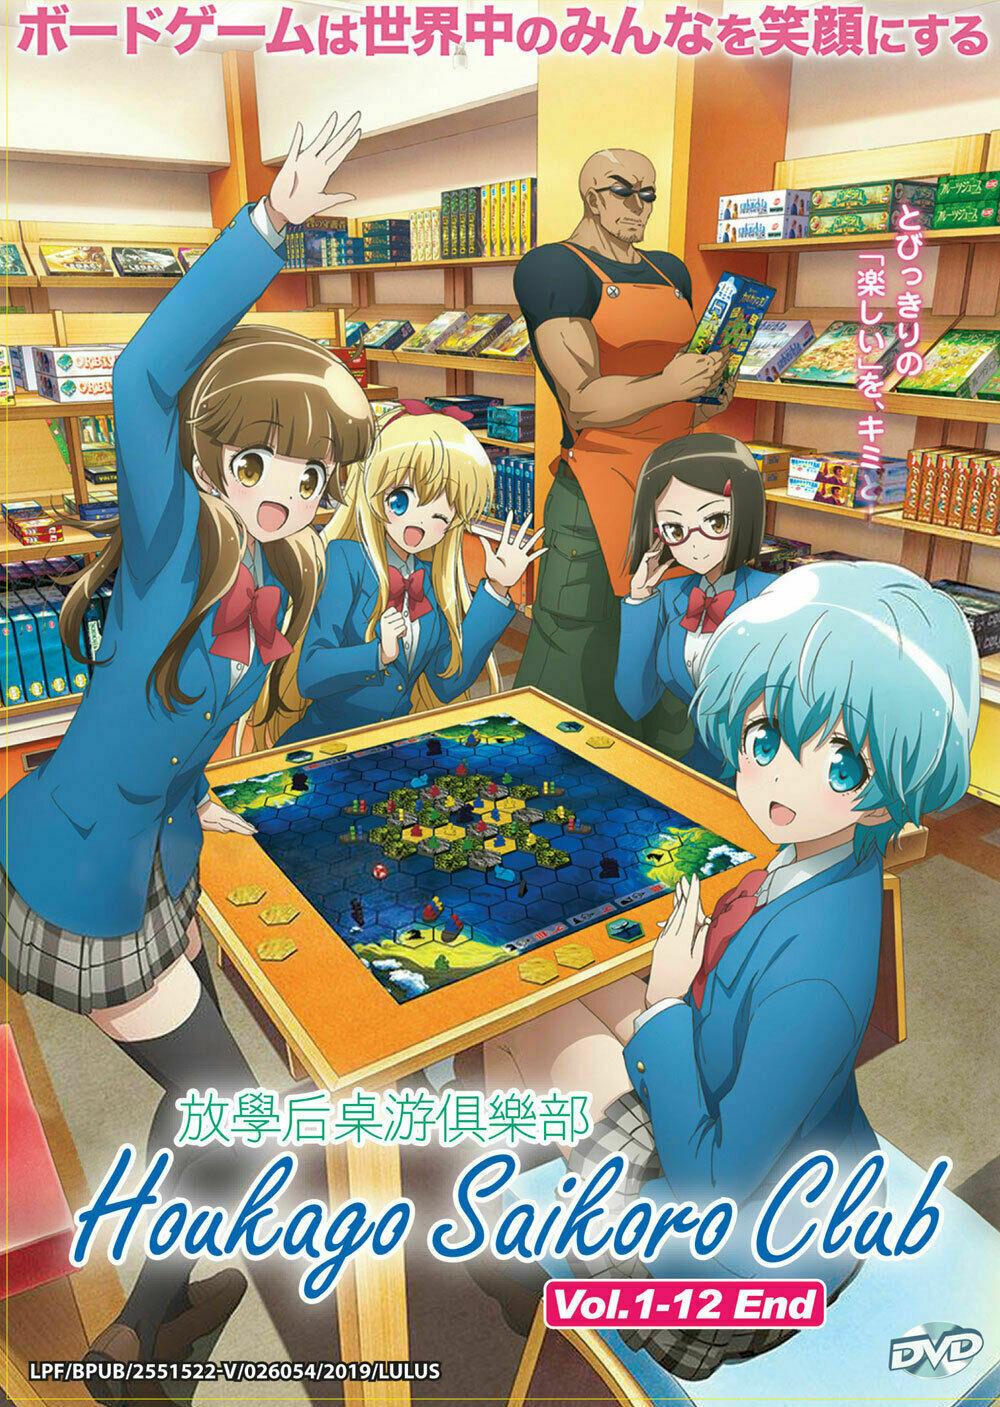 Houkago Saikoro Club DVD  (Eps.1-12 end) with English Audio Ship From USA